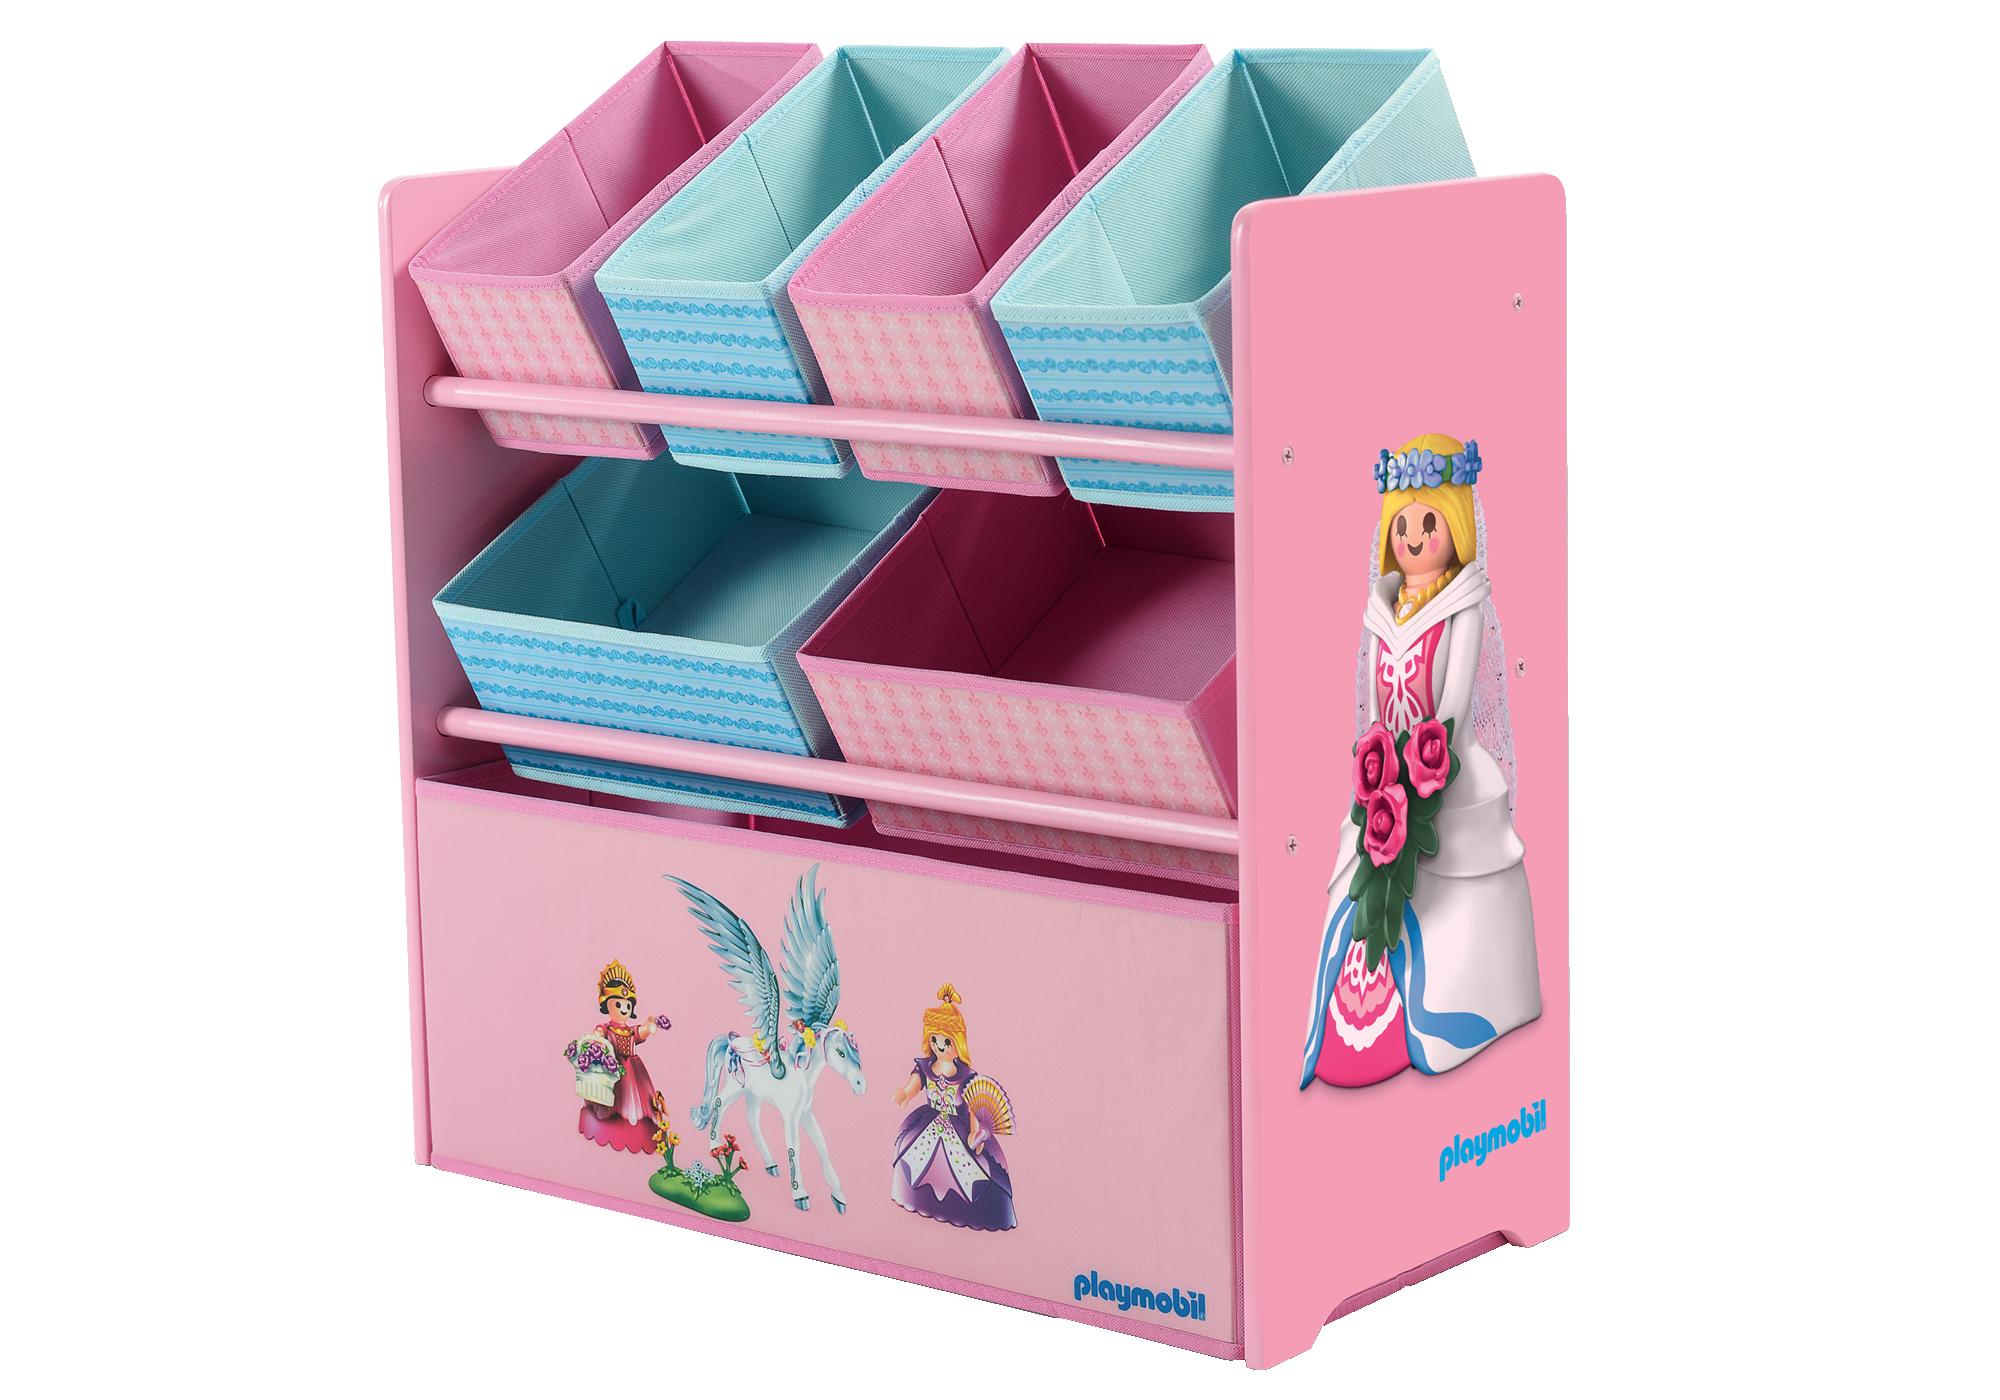 http://media.playmobil.com/i/playmobil/80466_product_detail